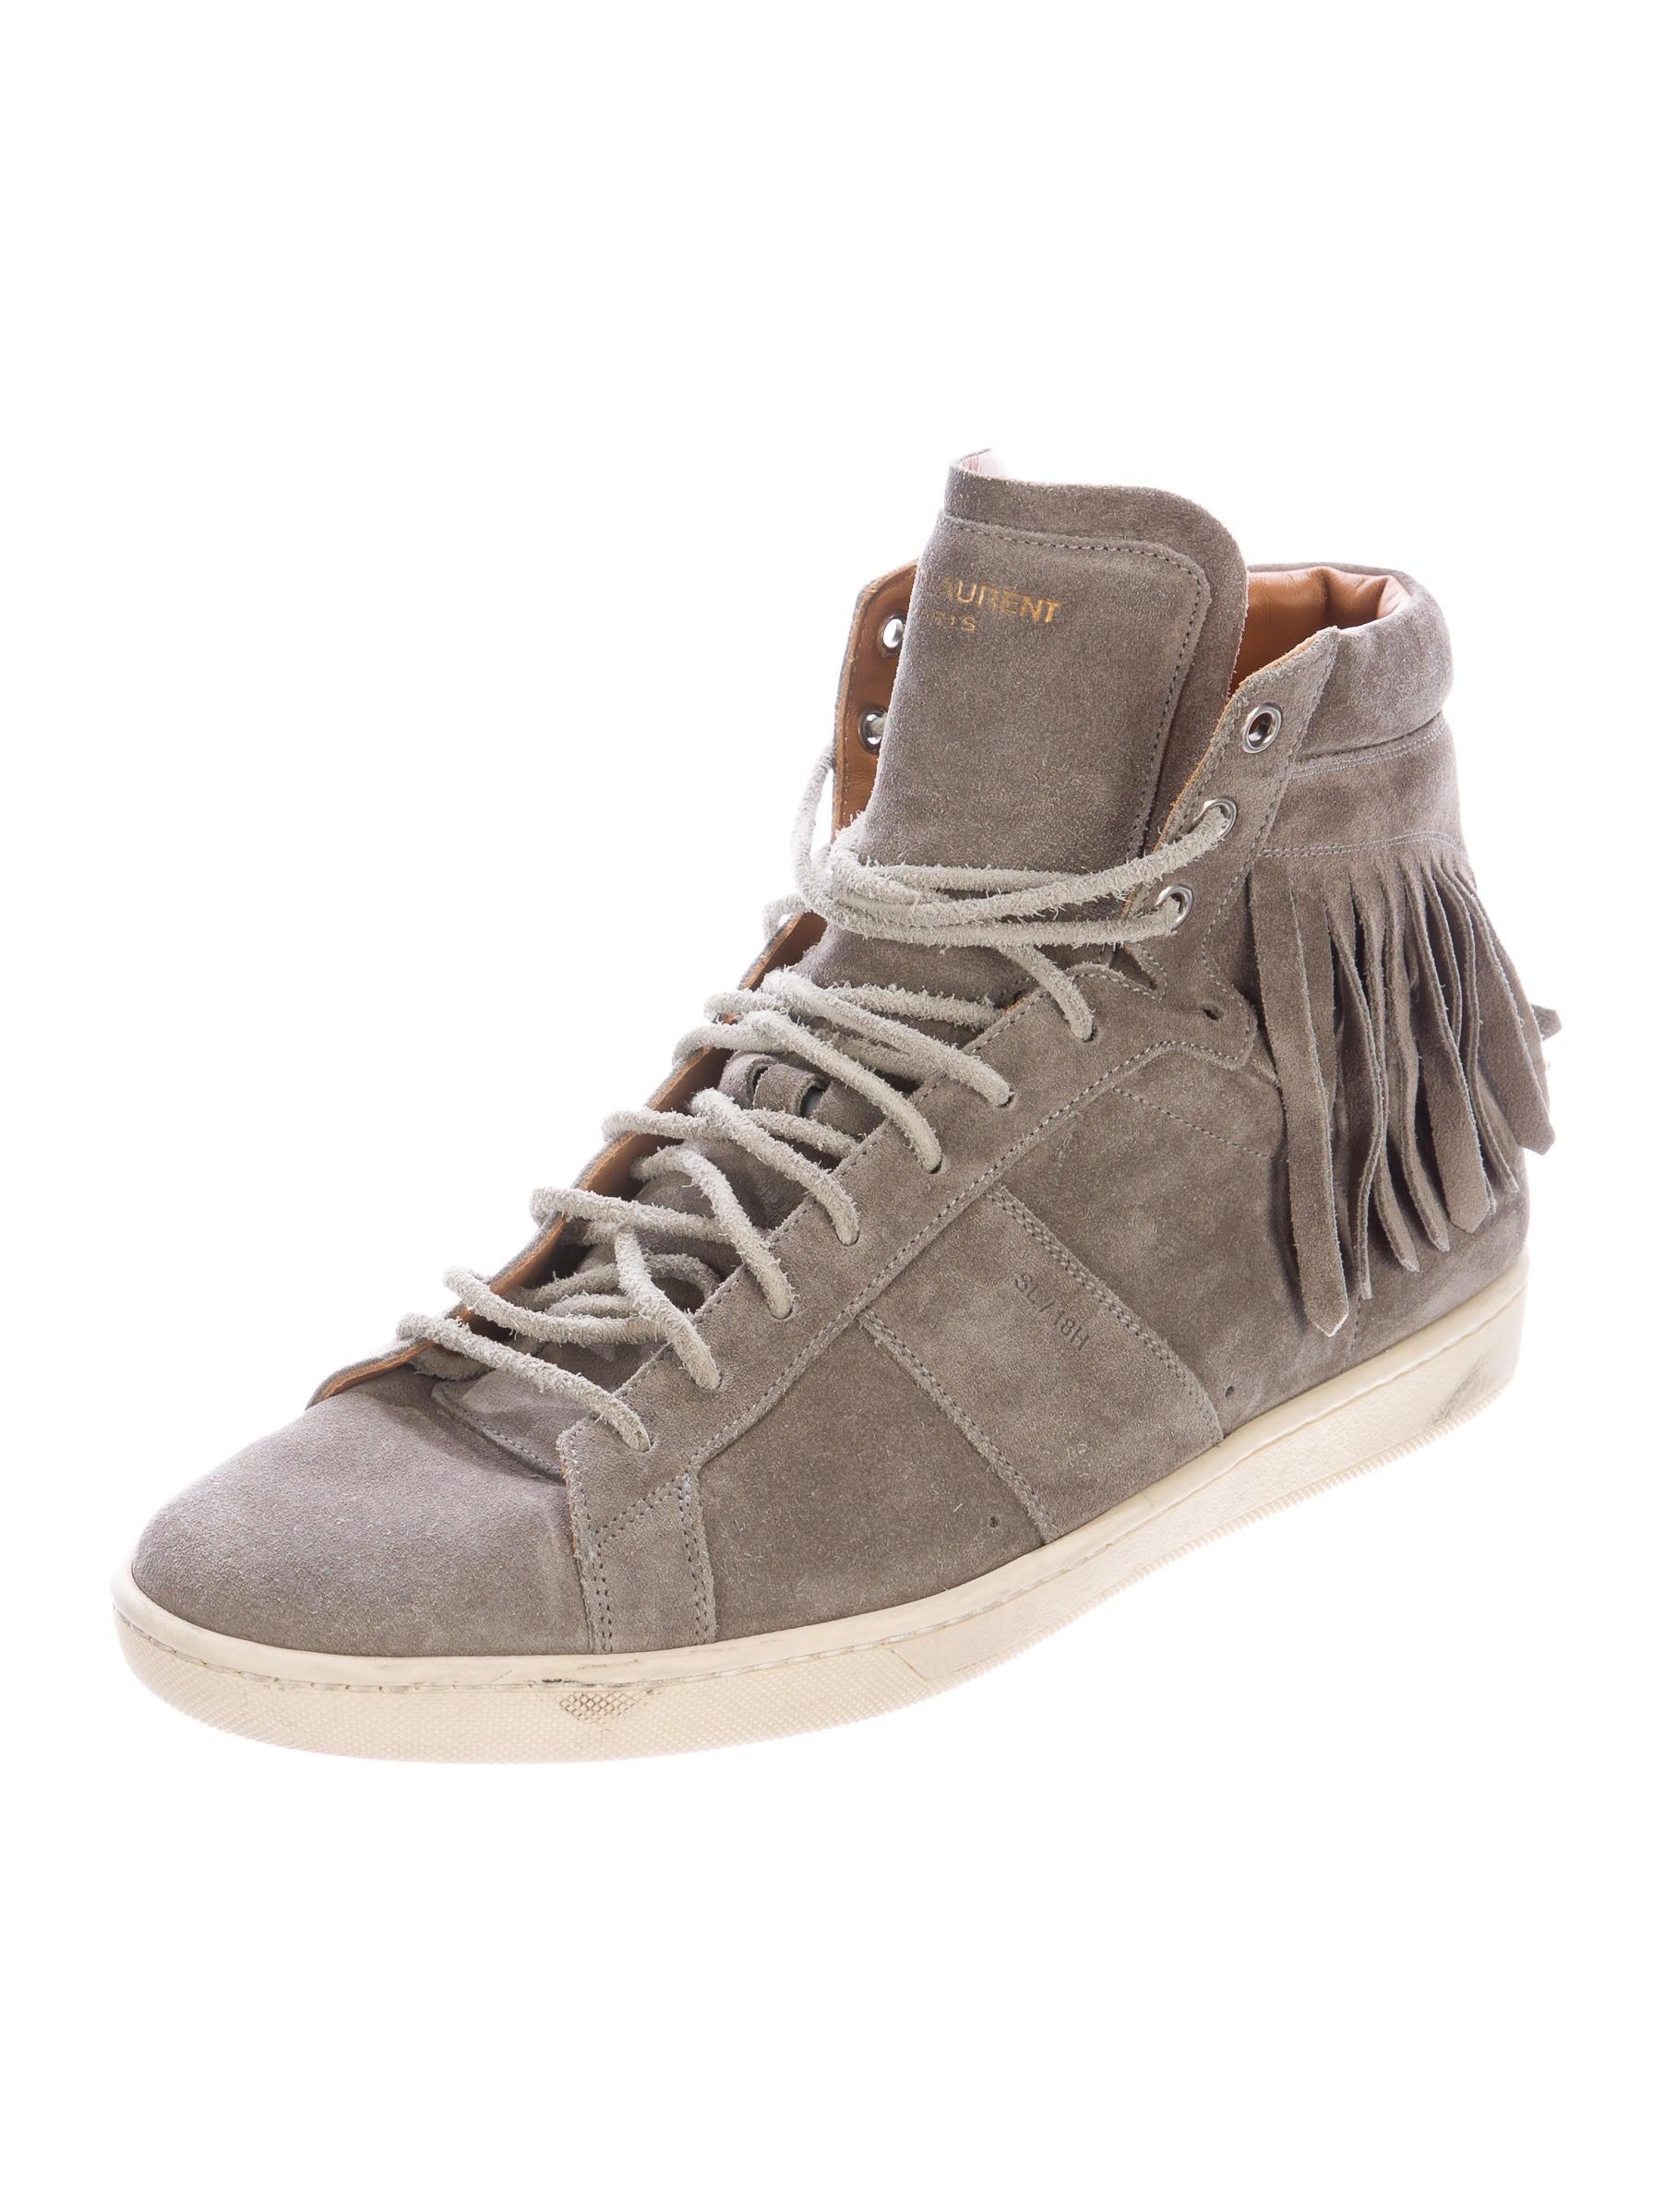 saint laurent suede sl 18h sneakers shoes snt33077 the realreal. Black Bedroom Furniture Sets. Home Design Ideas